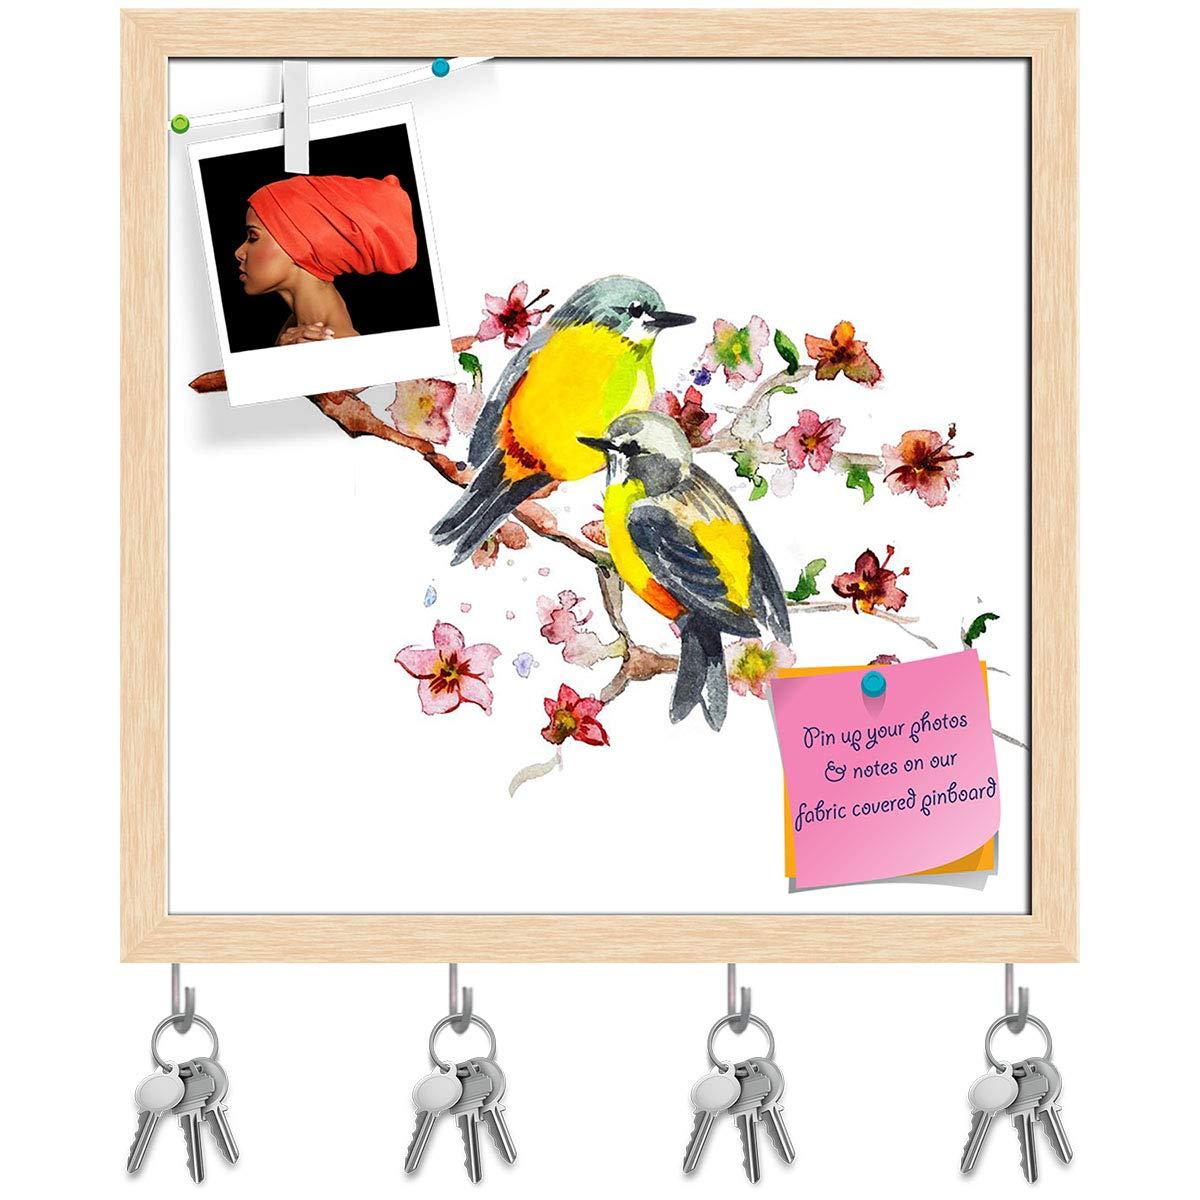 Natural Brown Frame 6inch x 6inch (15.2cms x 15.2cms) Artzfolio Cute Bird D3 Key Holder Hooks   Notice Pin Board   White Frame 16.1 X 16Inch